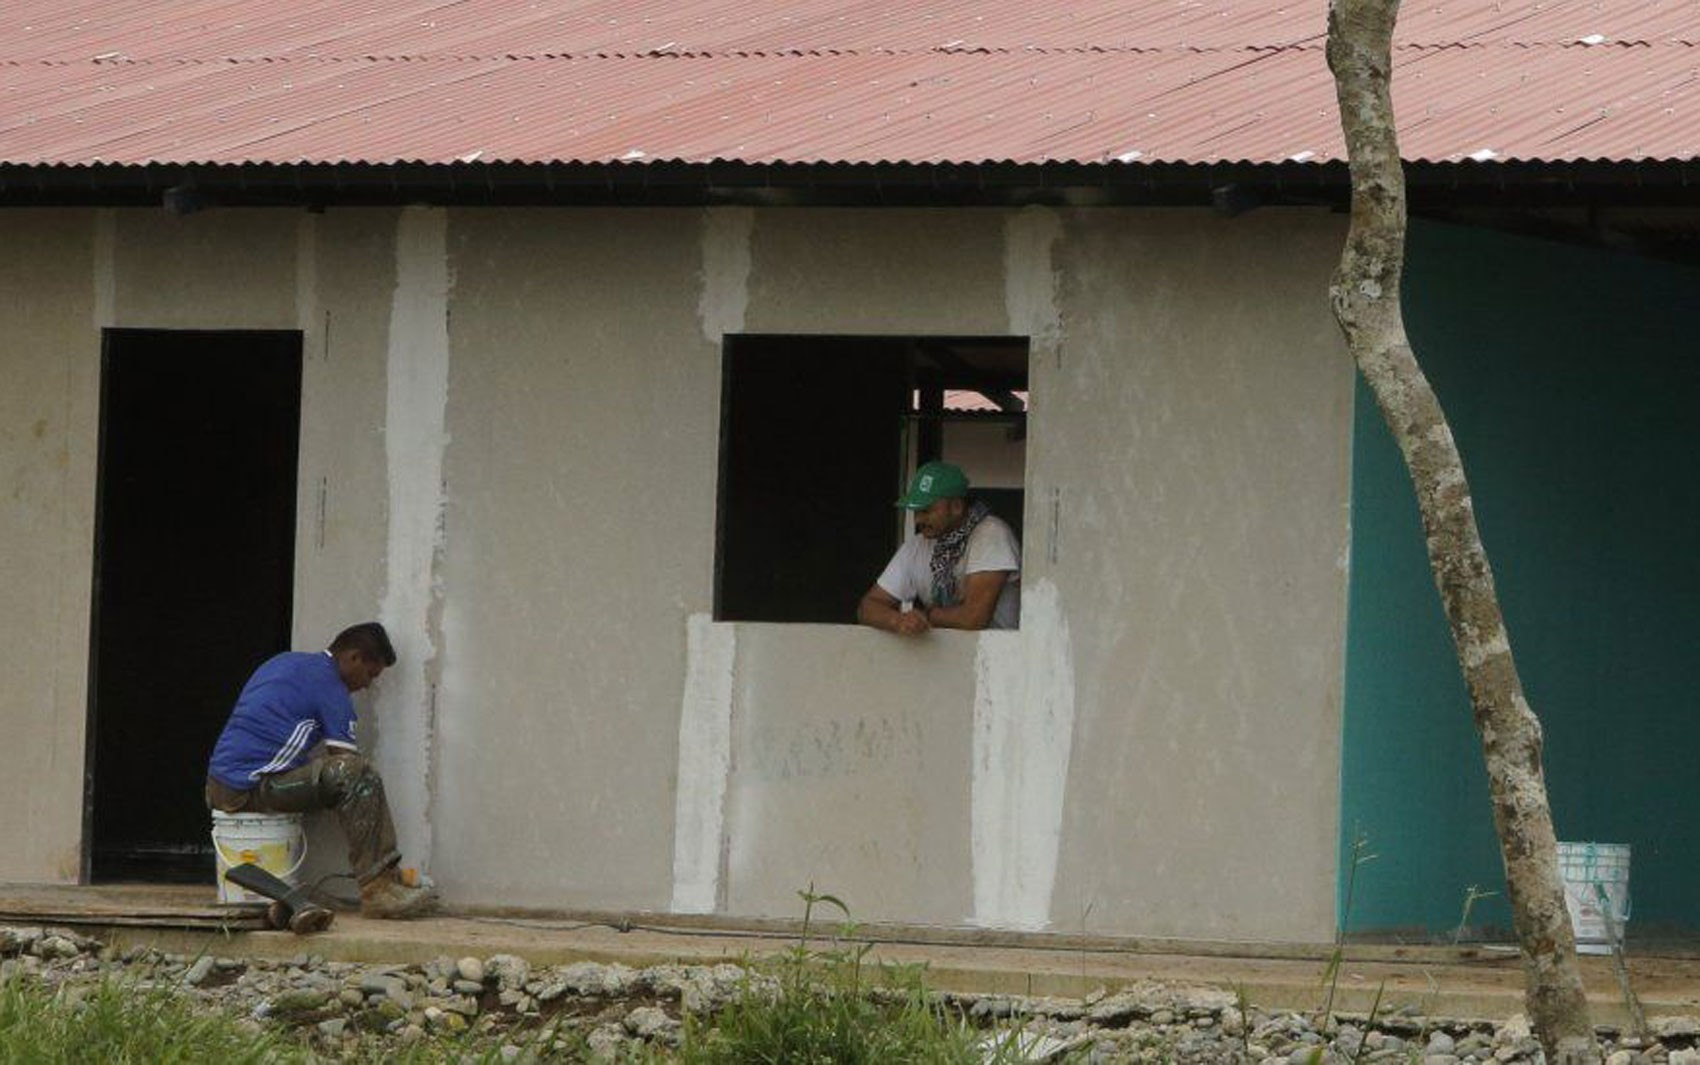 O hotel construído por ex-integrantes das Farc para recriar a vida de guerrilheiros na selva da Colômbia